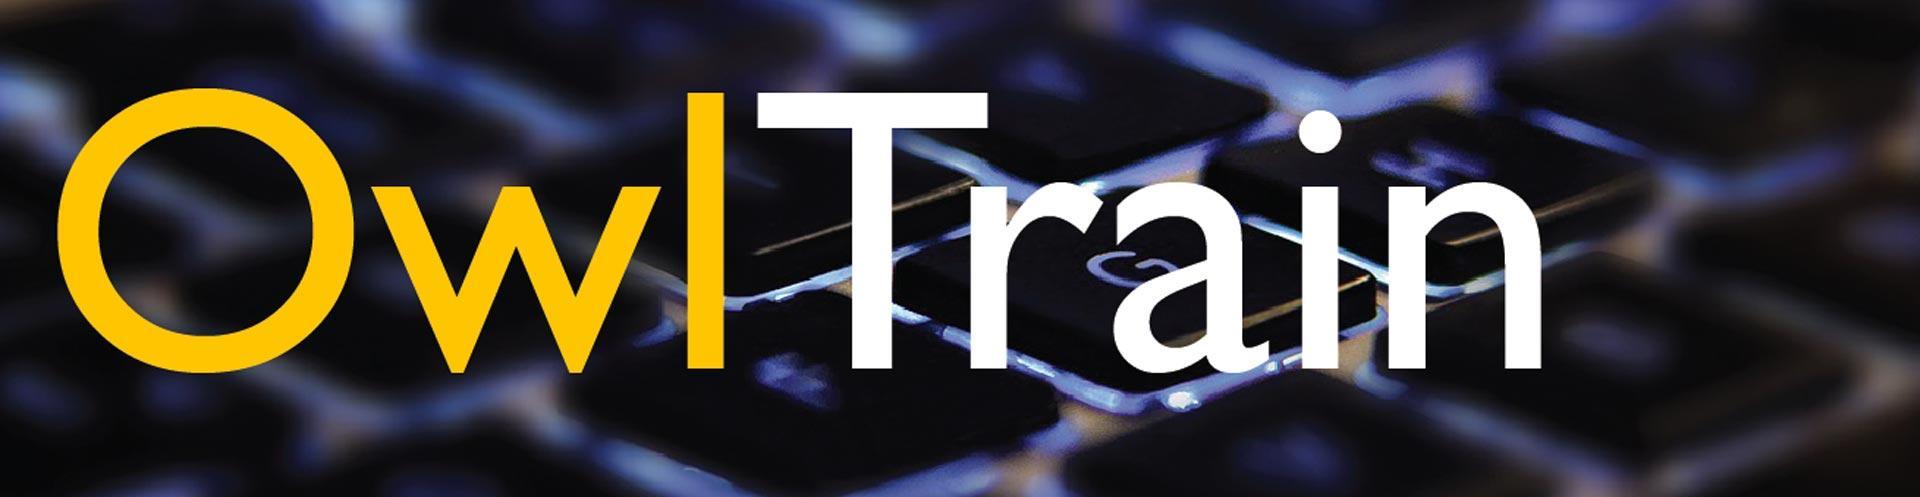 Need Software Training?